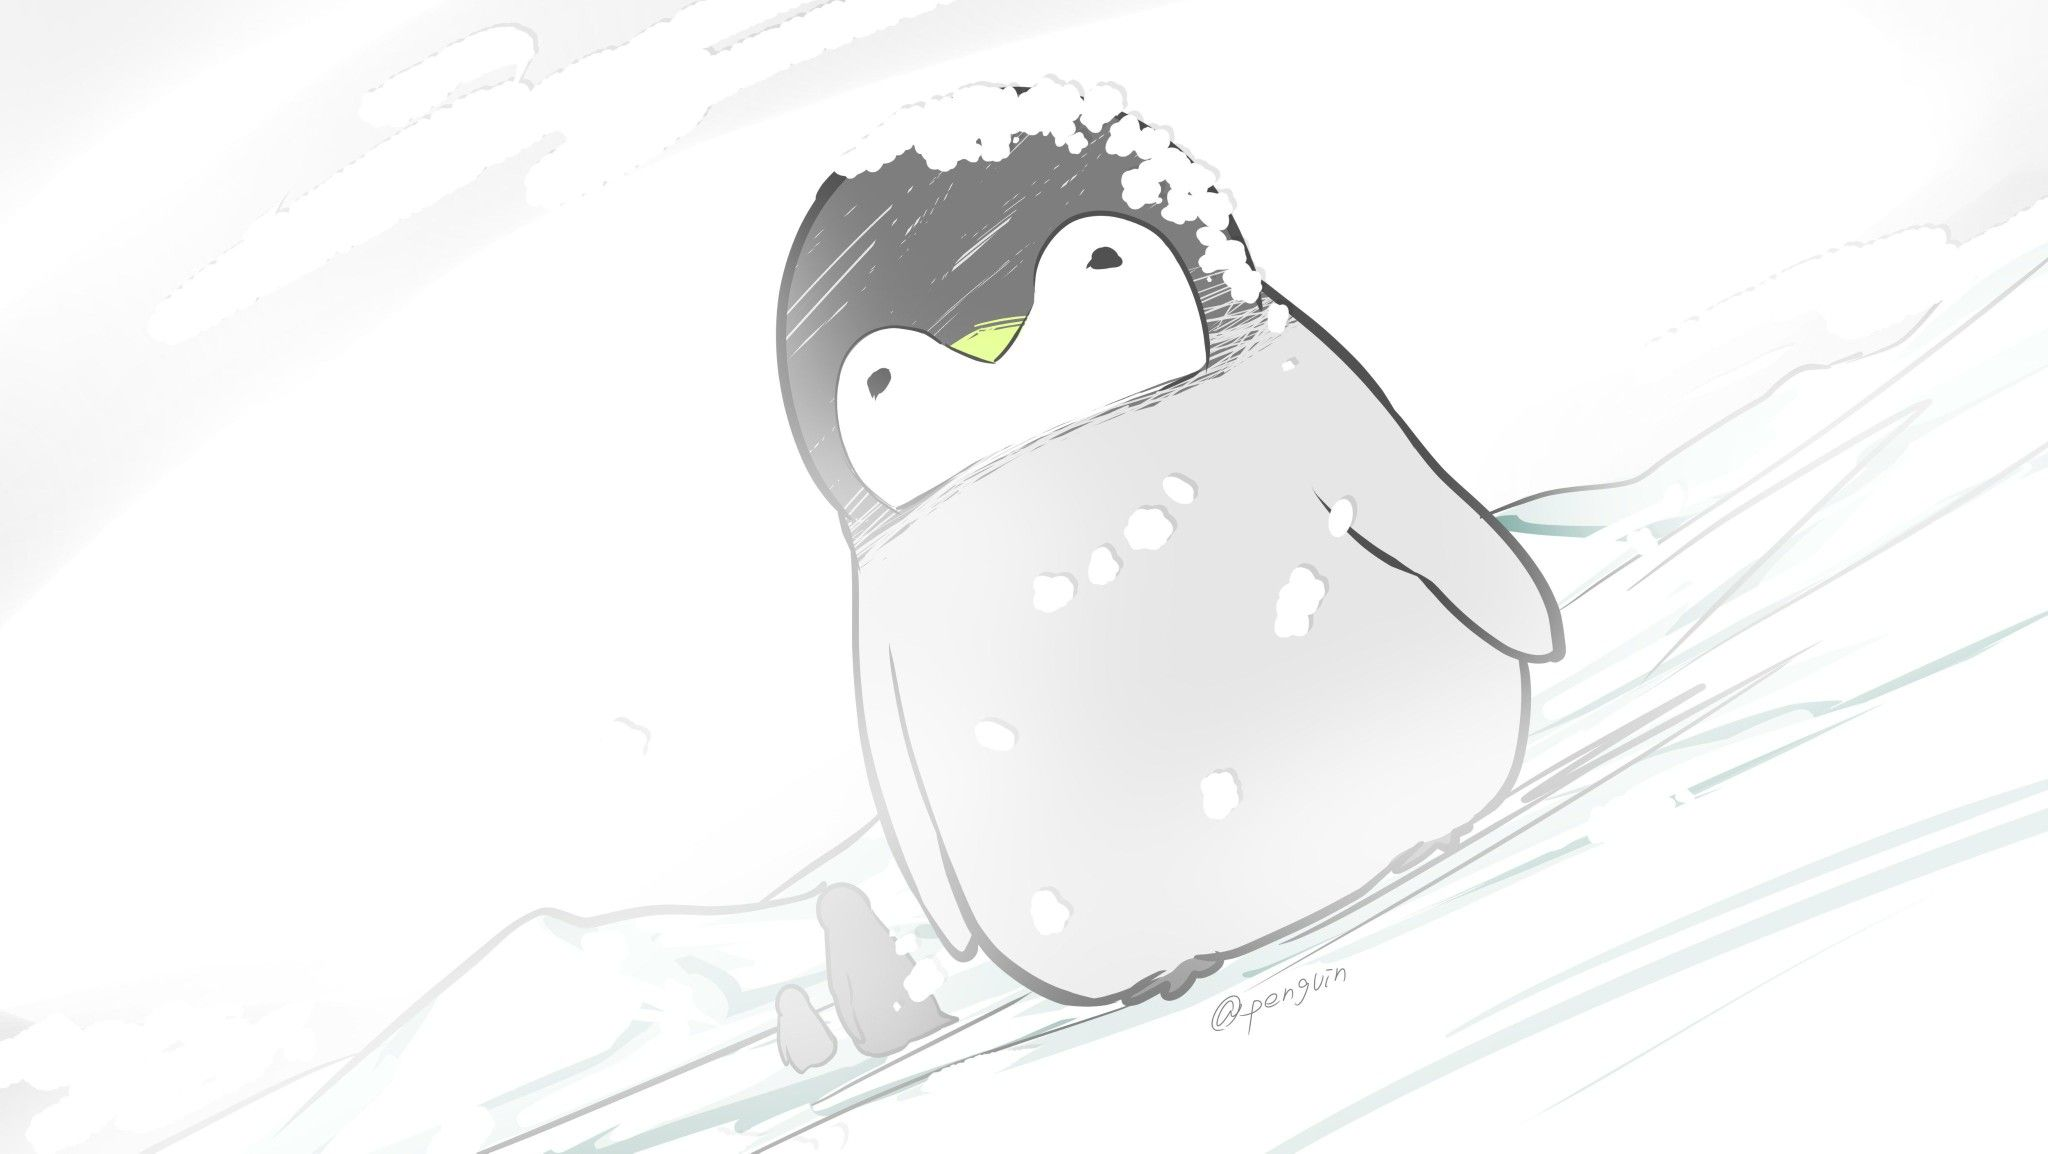 Penguin Kawaii In 2019 Penguin Cartoon Penguin Art